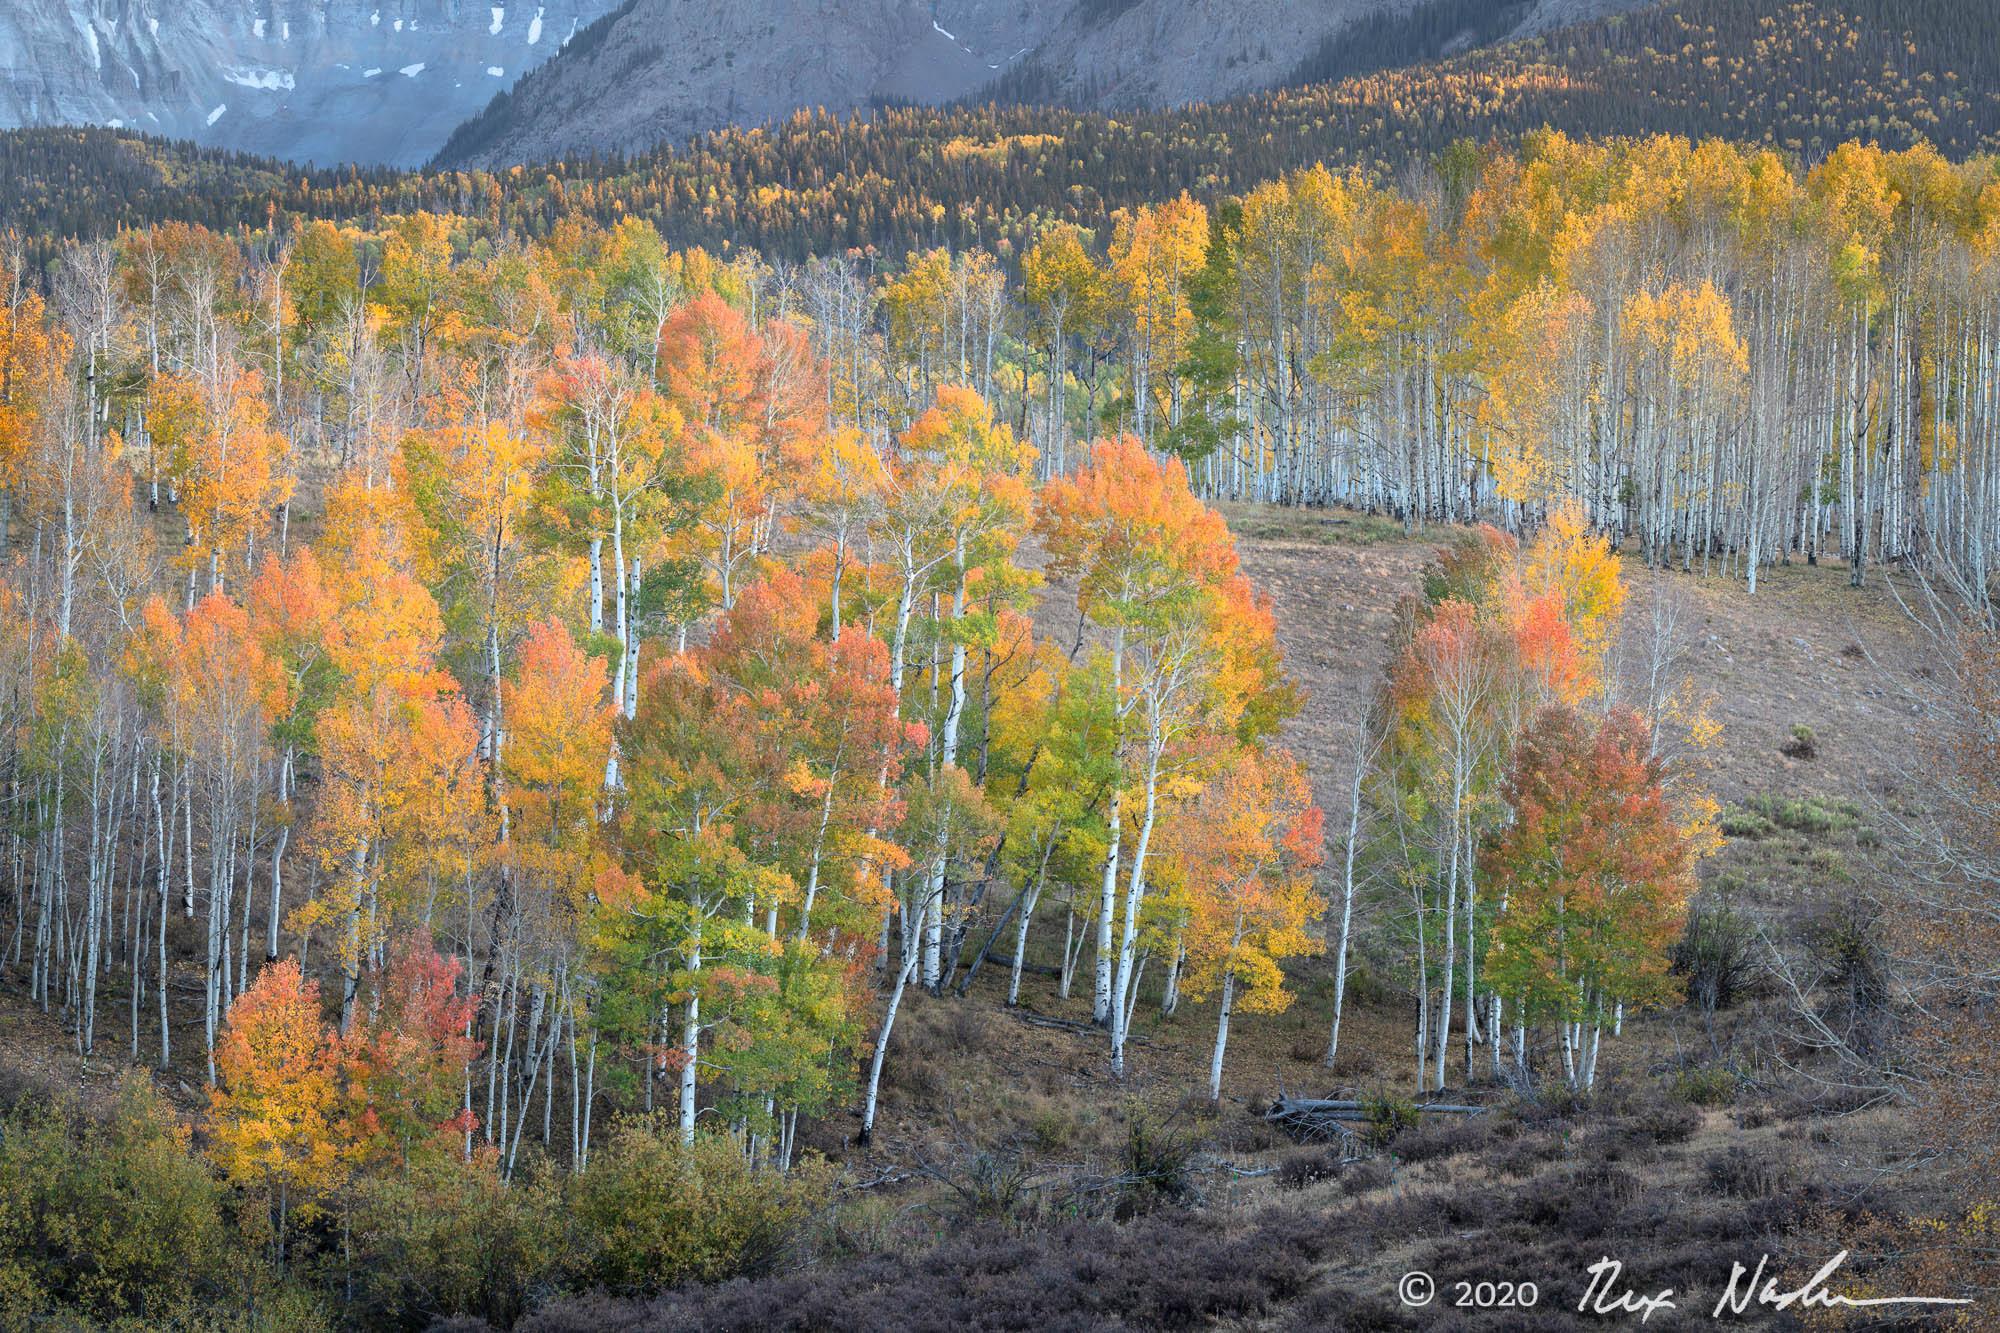 Park - San Juan Mountains, Colorado